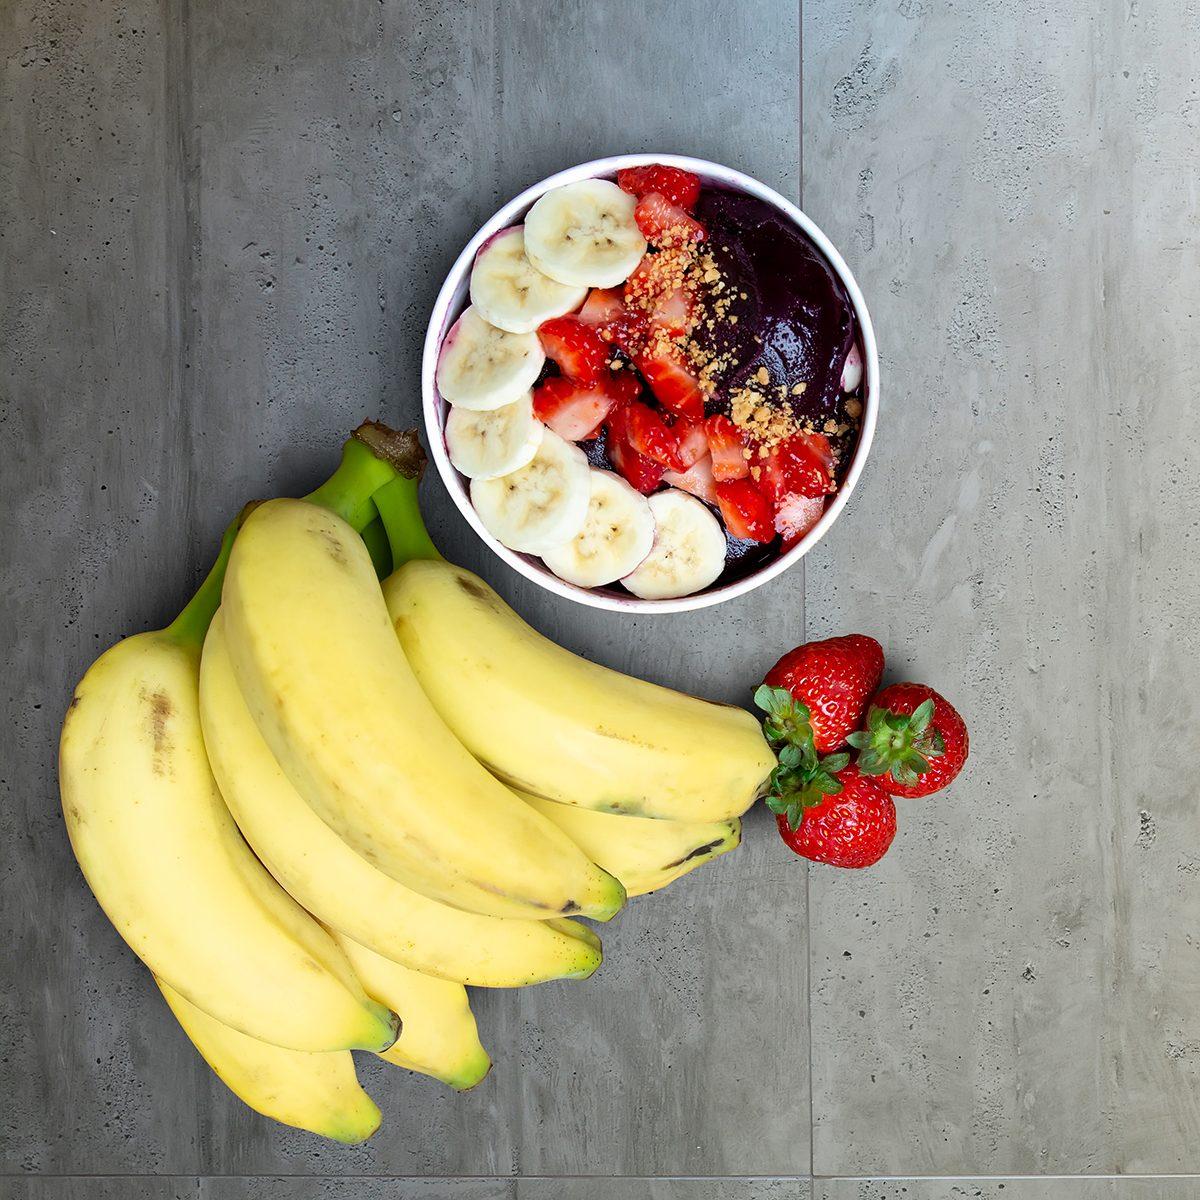 Acai Bowl With Fruits Salad Banana Mango Kiwi and Strawberry, Delicious Açaí Brazilian Cream Dessert, Açai na Tigela with copy space